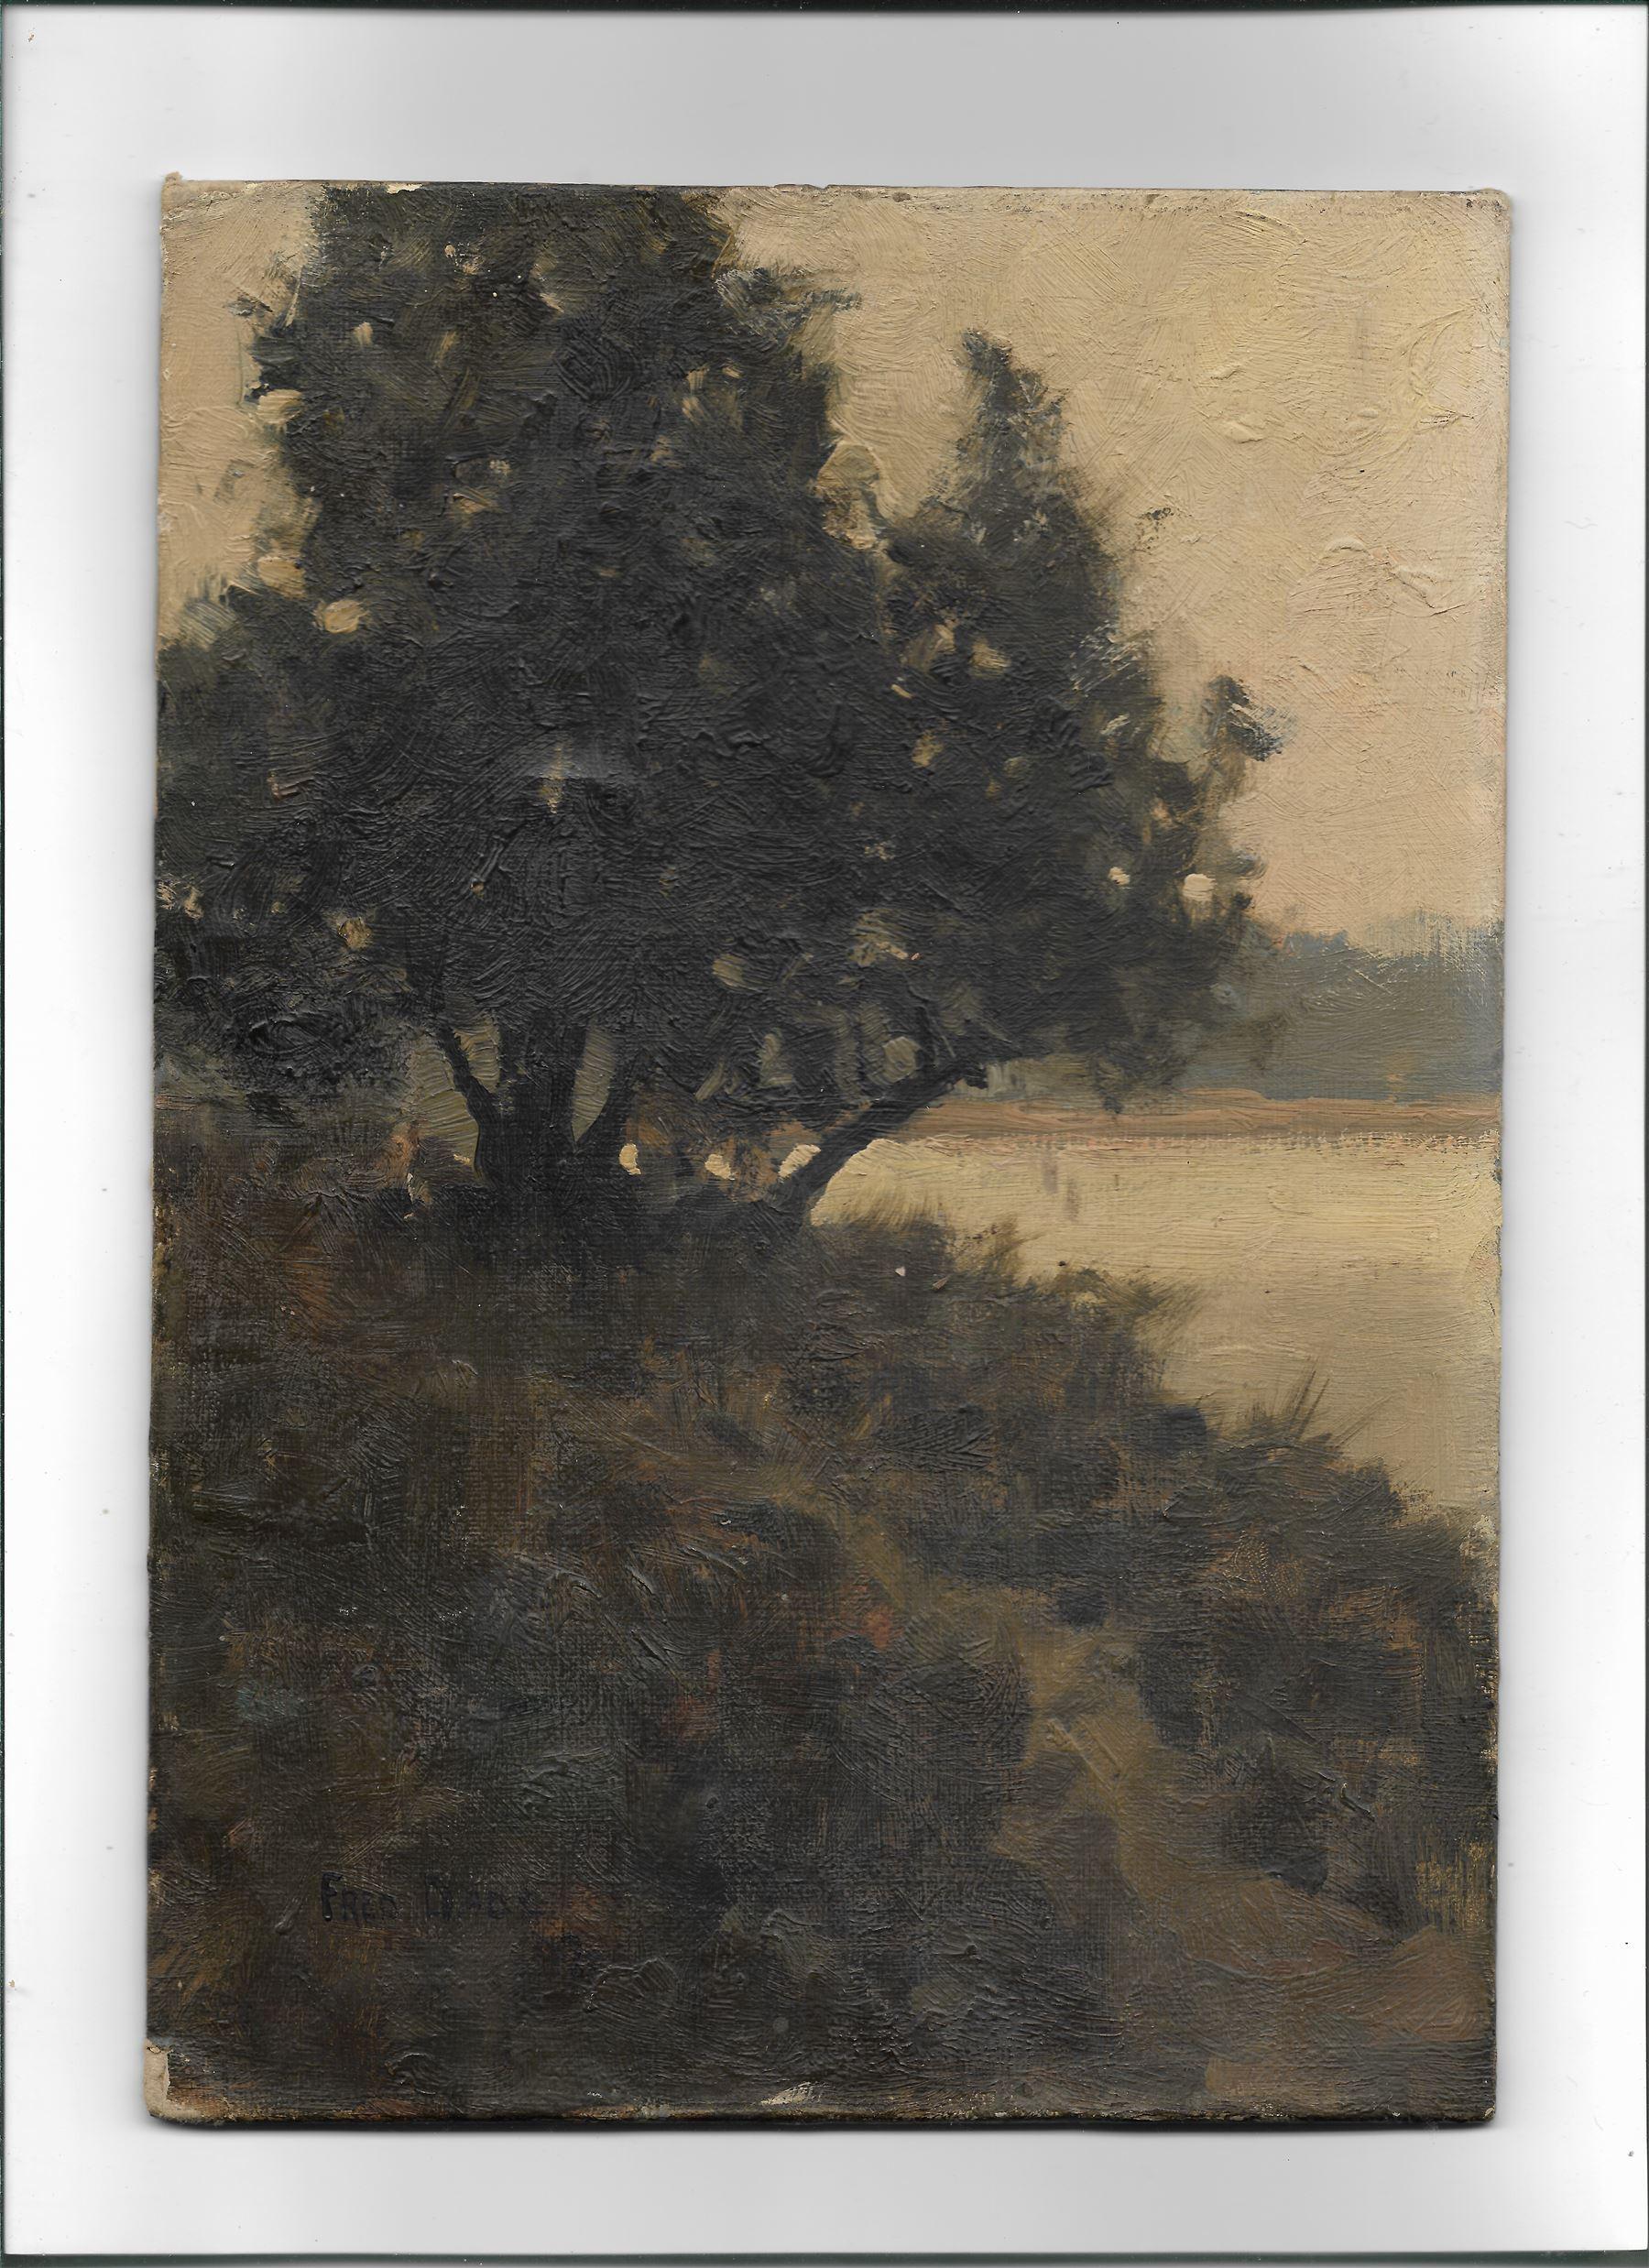 Frederick (Fred) Dade (British 1874-1908): Edge of the Lake - Image 2 of 4